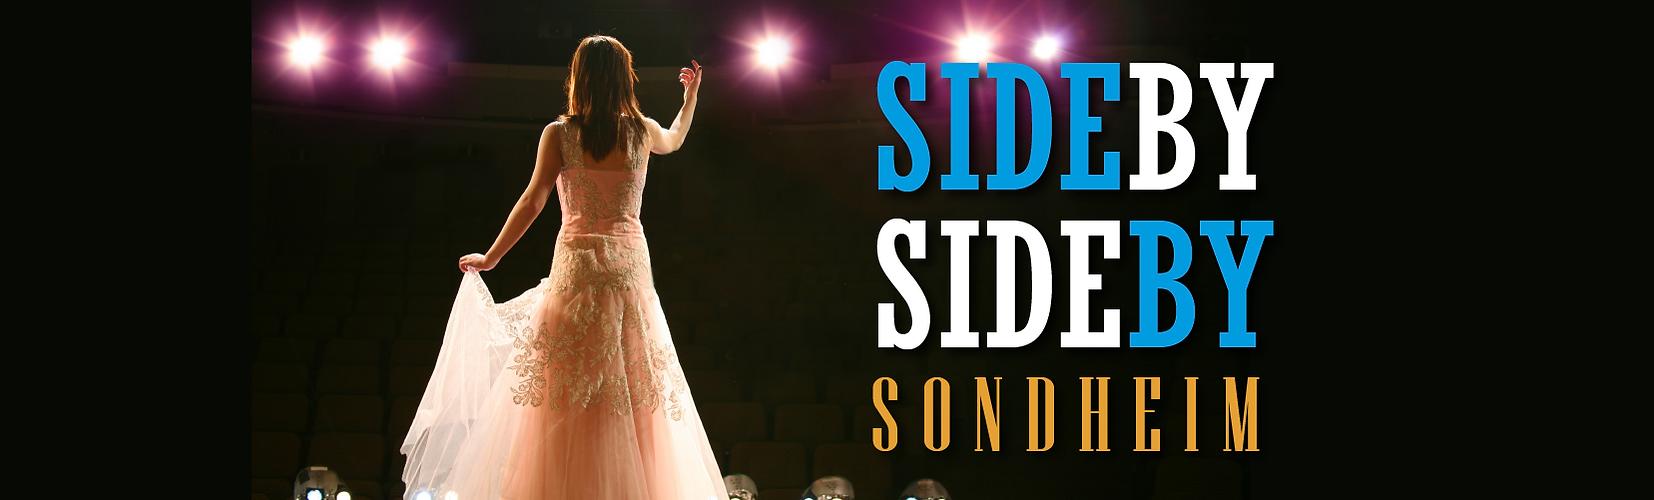 Web-Home-Show-Headers-SideBySide-01.png